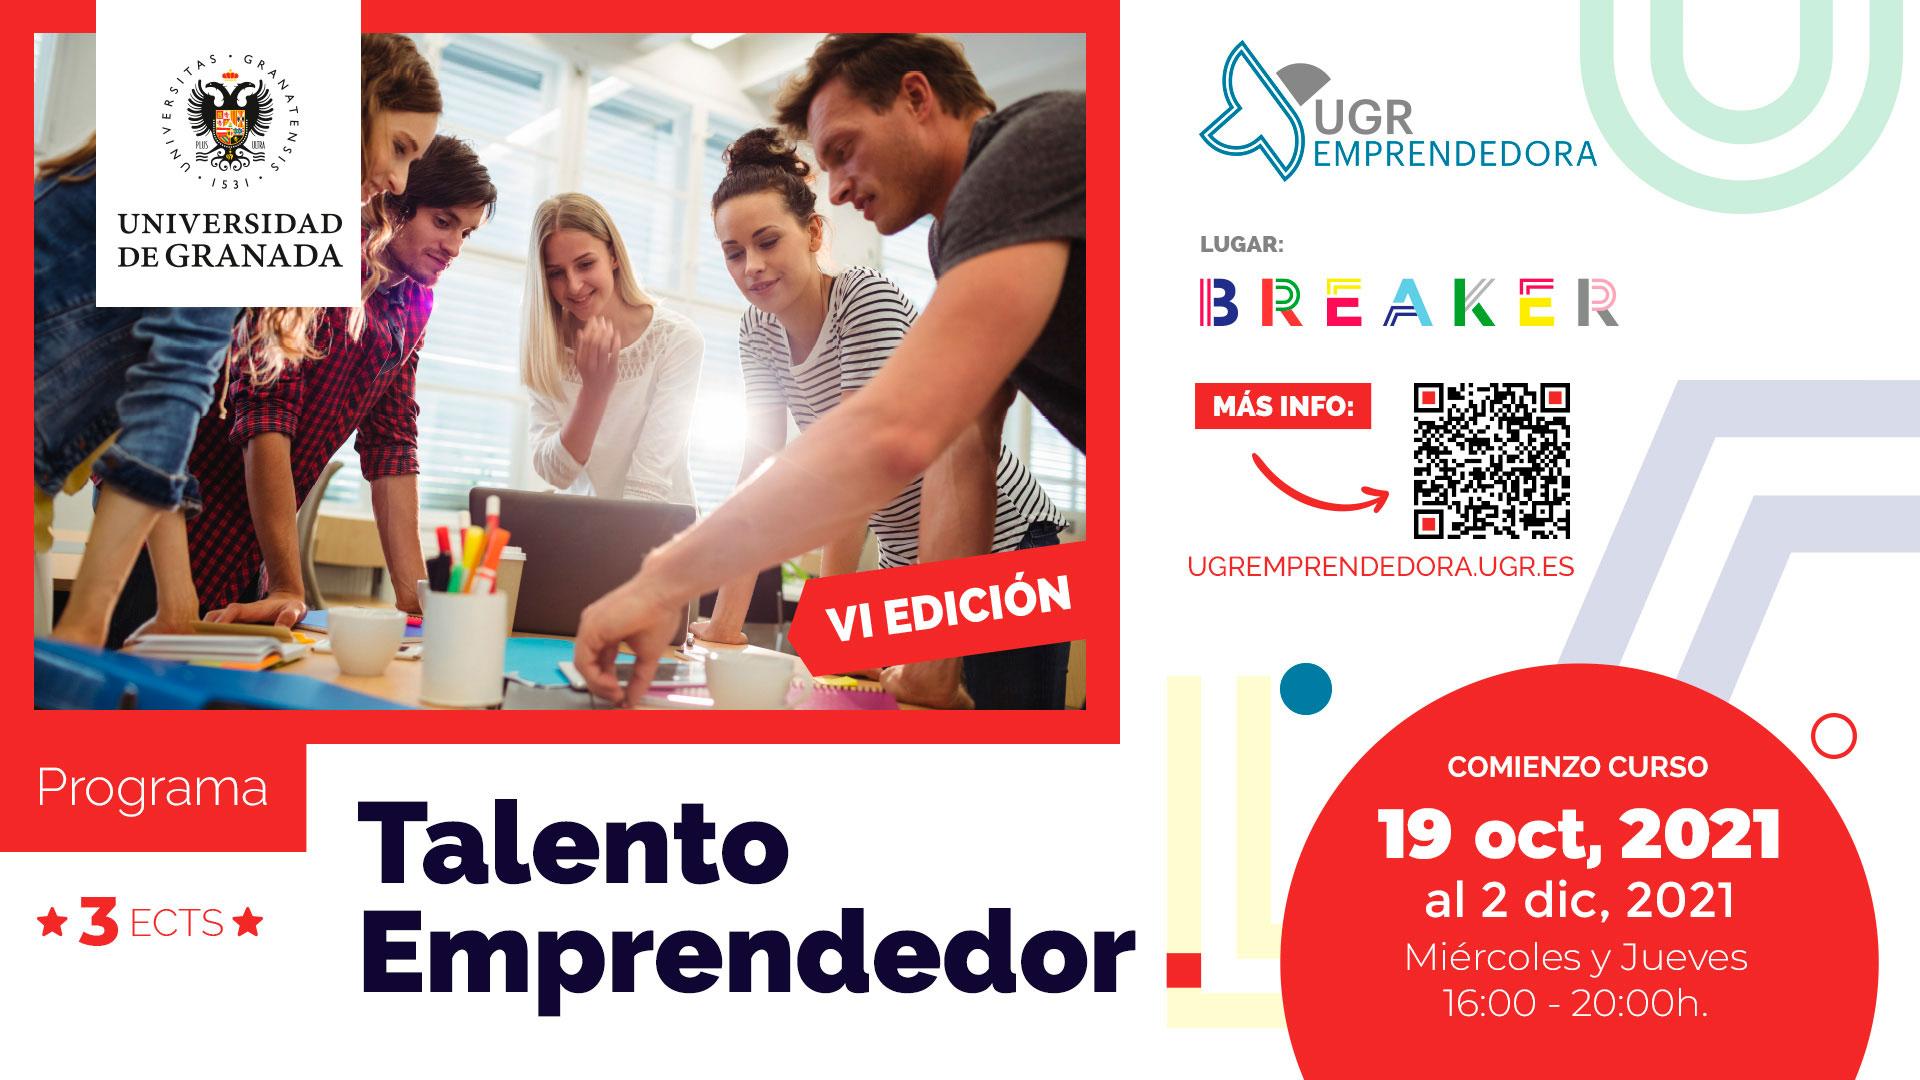 Programa Talento Emprendedor 2021